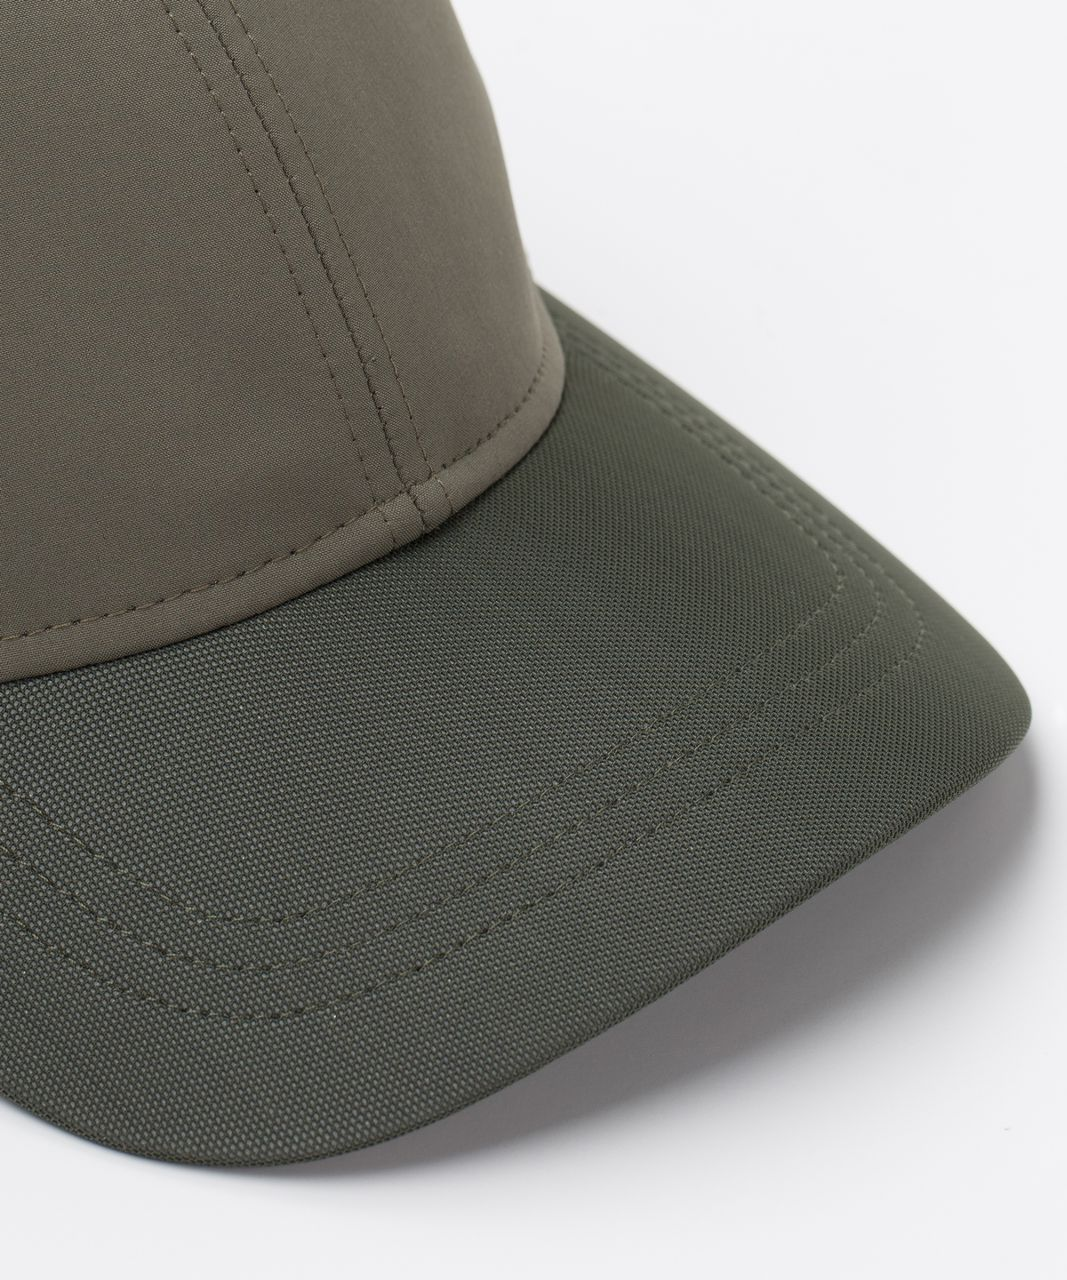 Lululemon Baller Hat - Fatigue Green / Heathered Gator Green